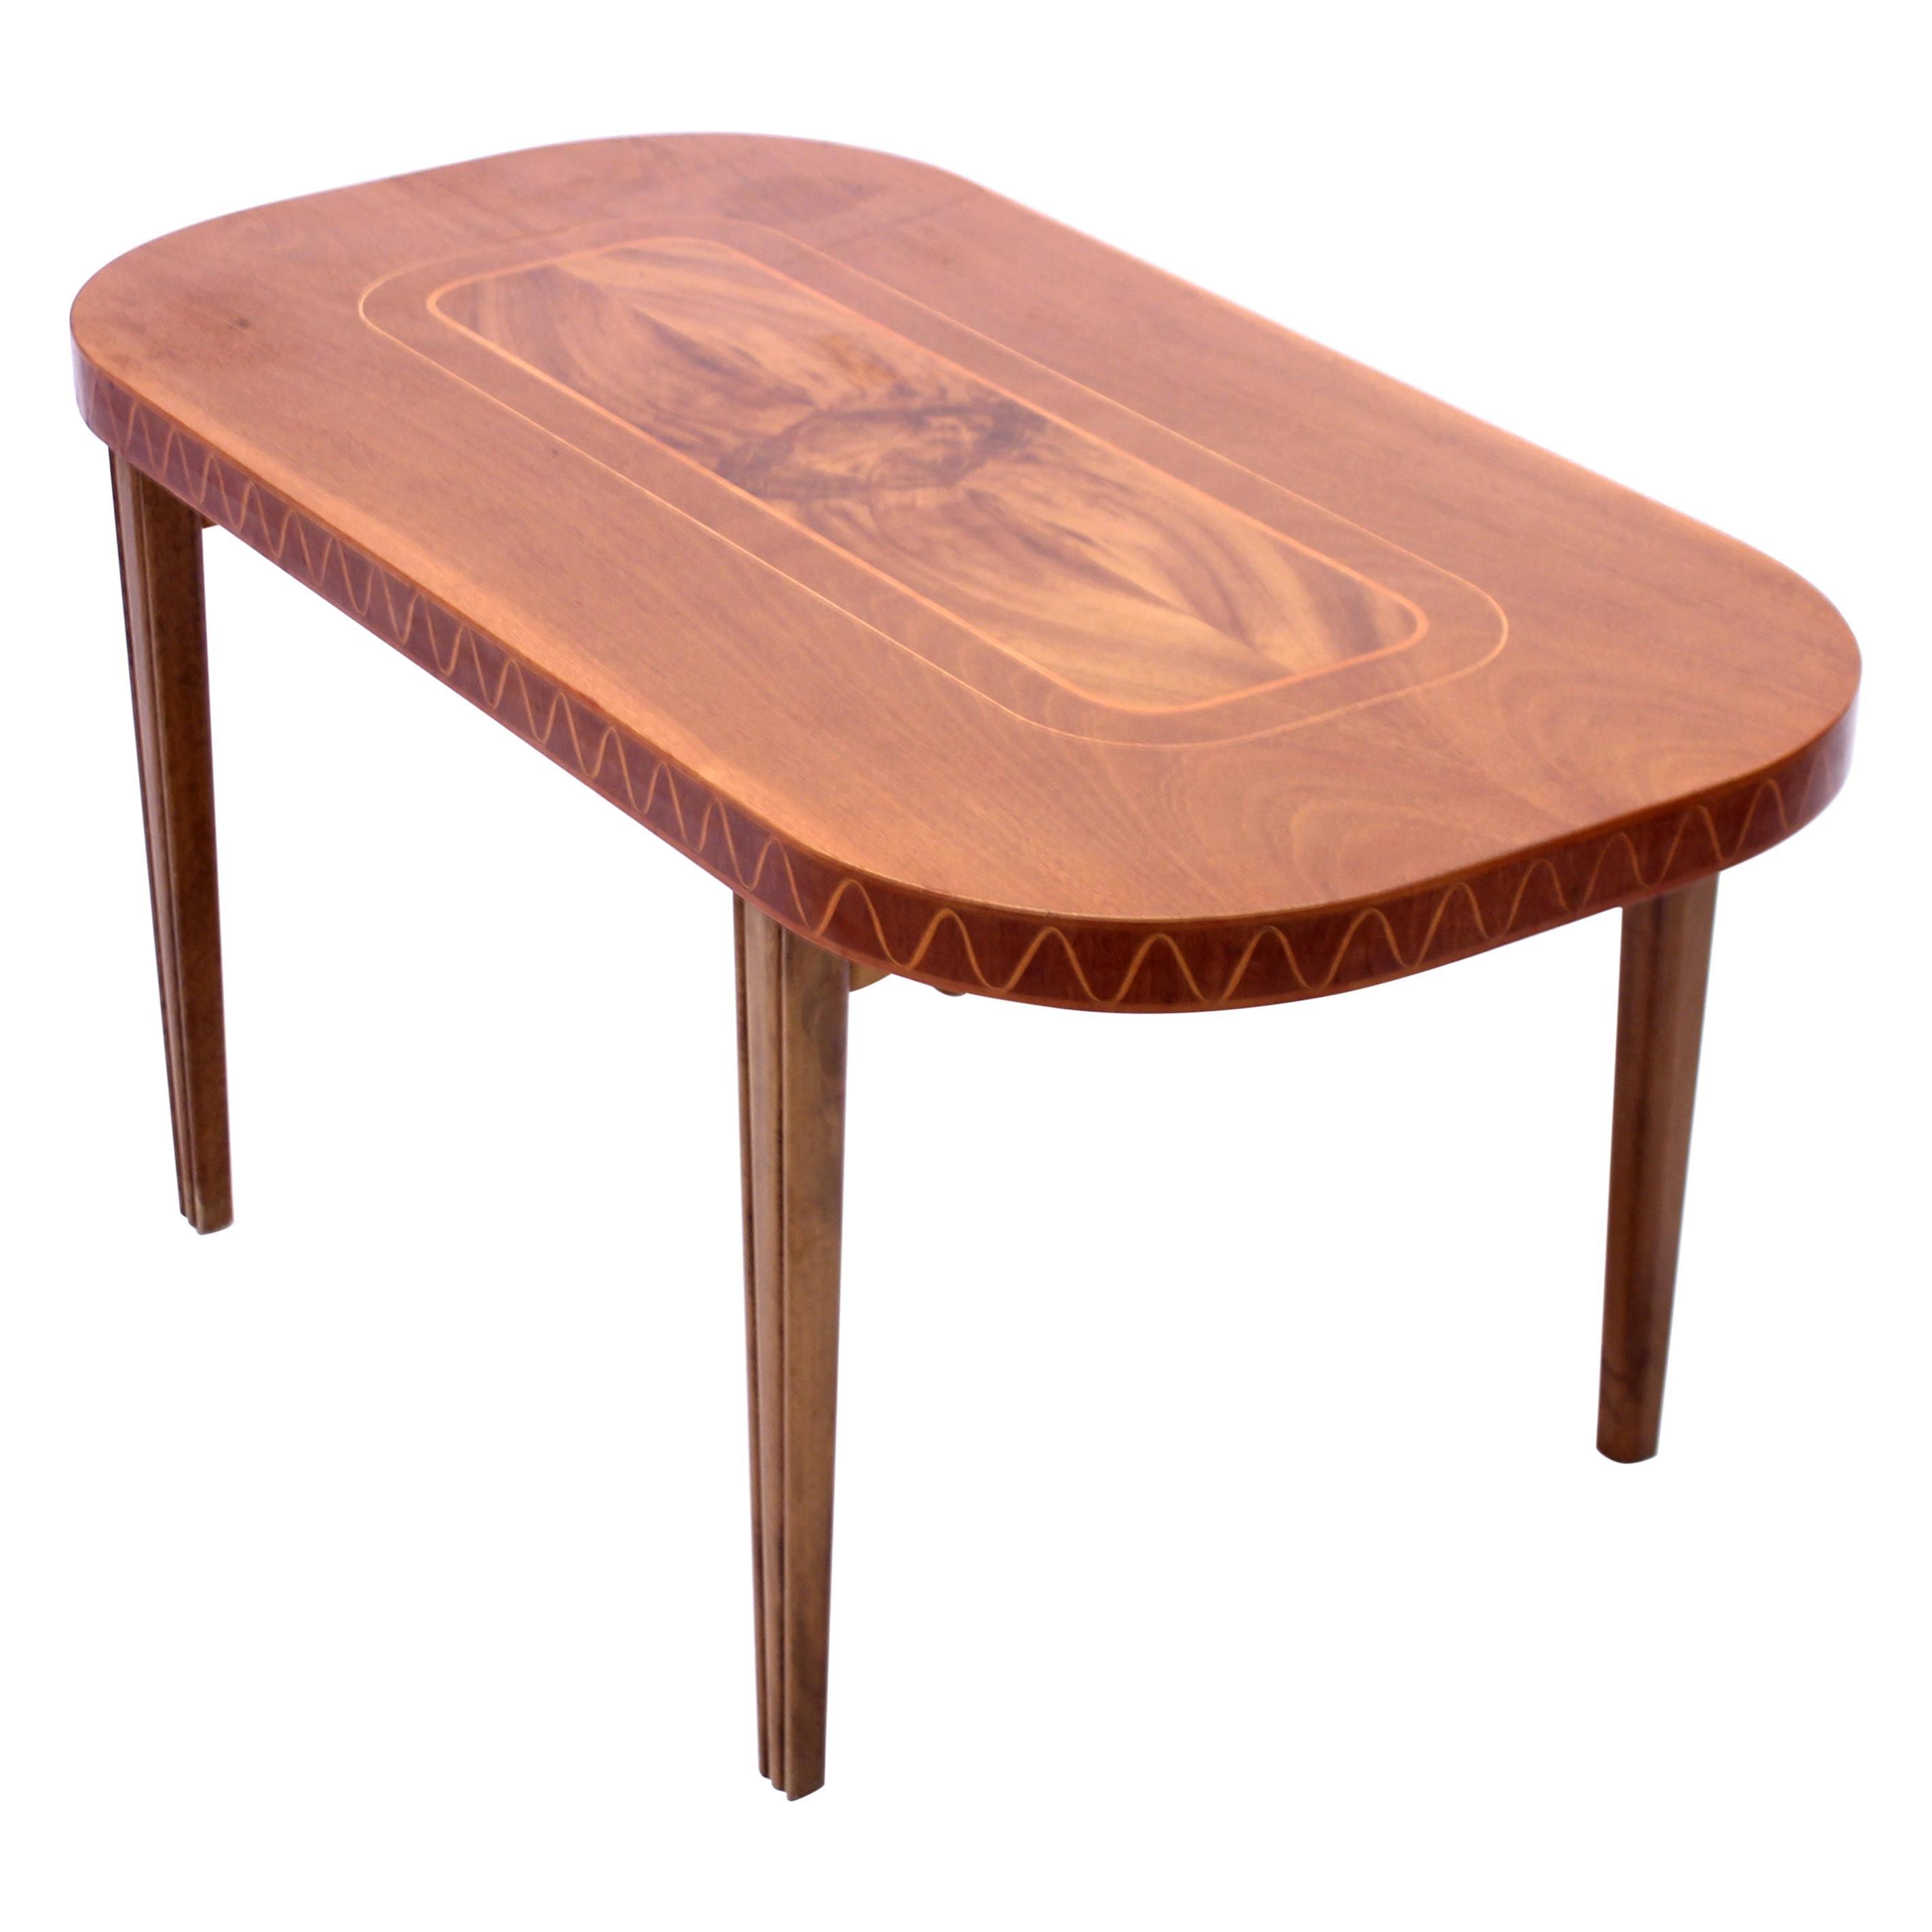 Swedish Modern Coffee Table, 1940s